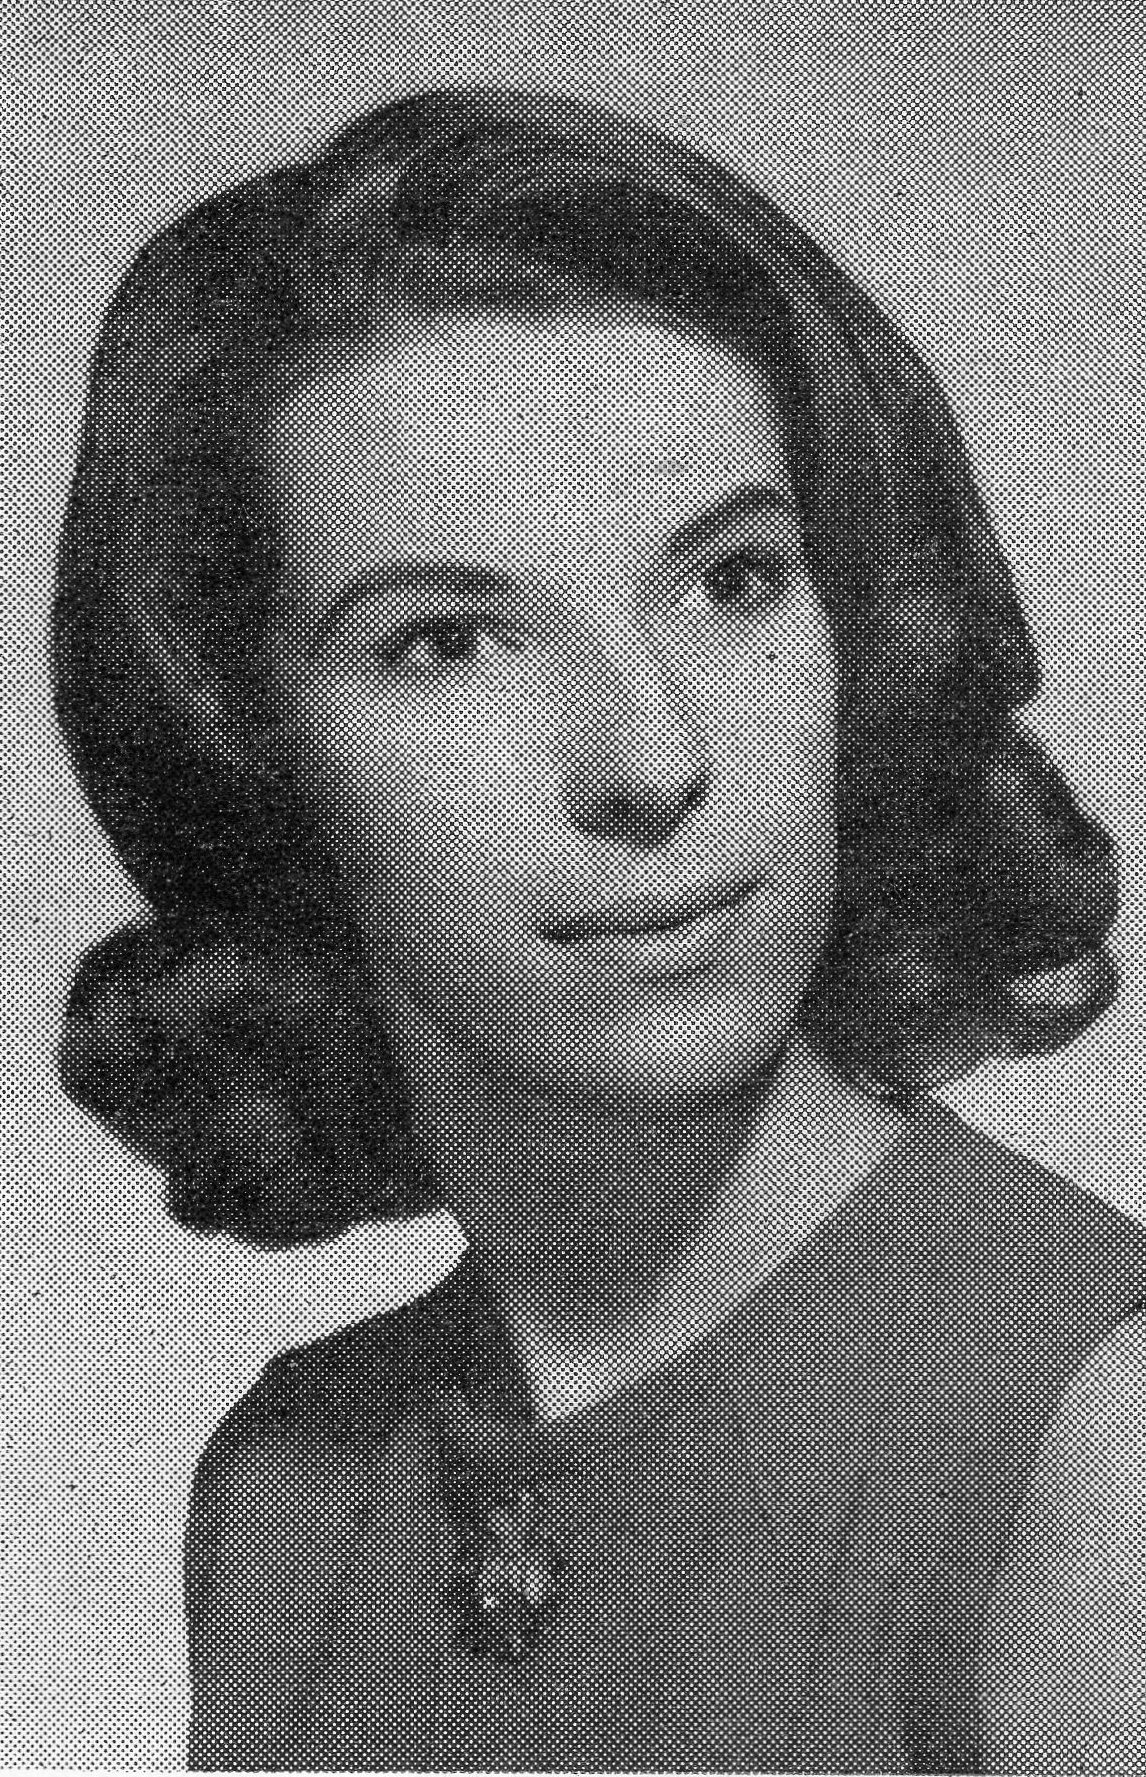 Barbara Ann Cairns, tap specialty